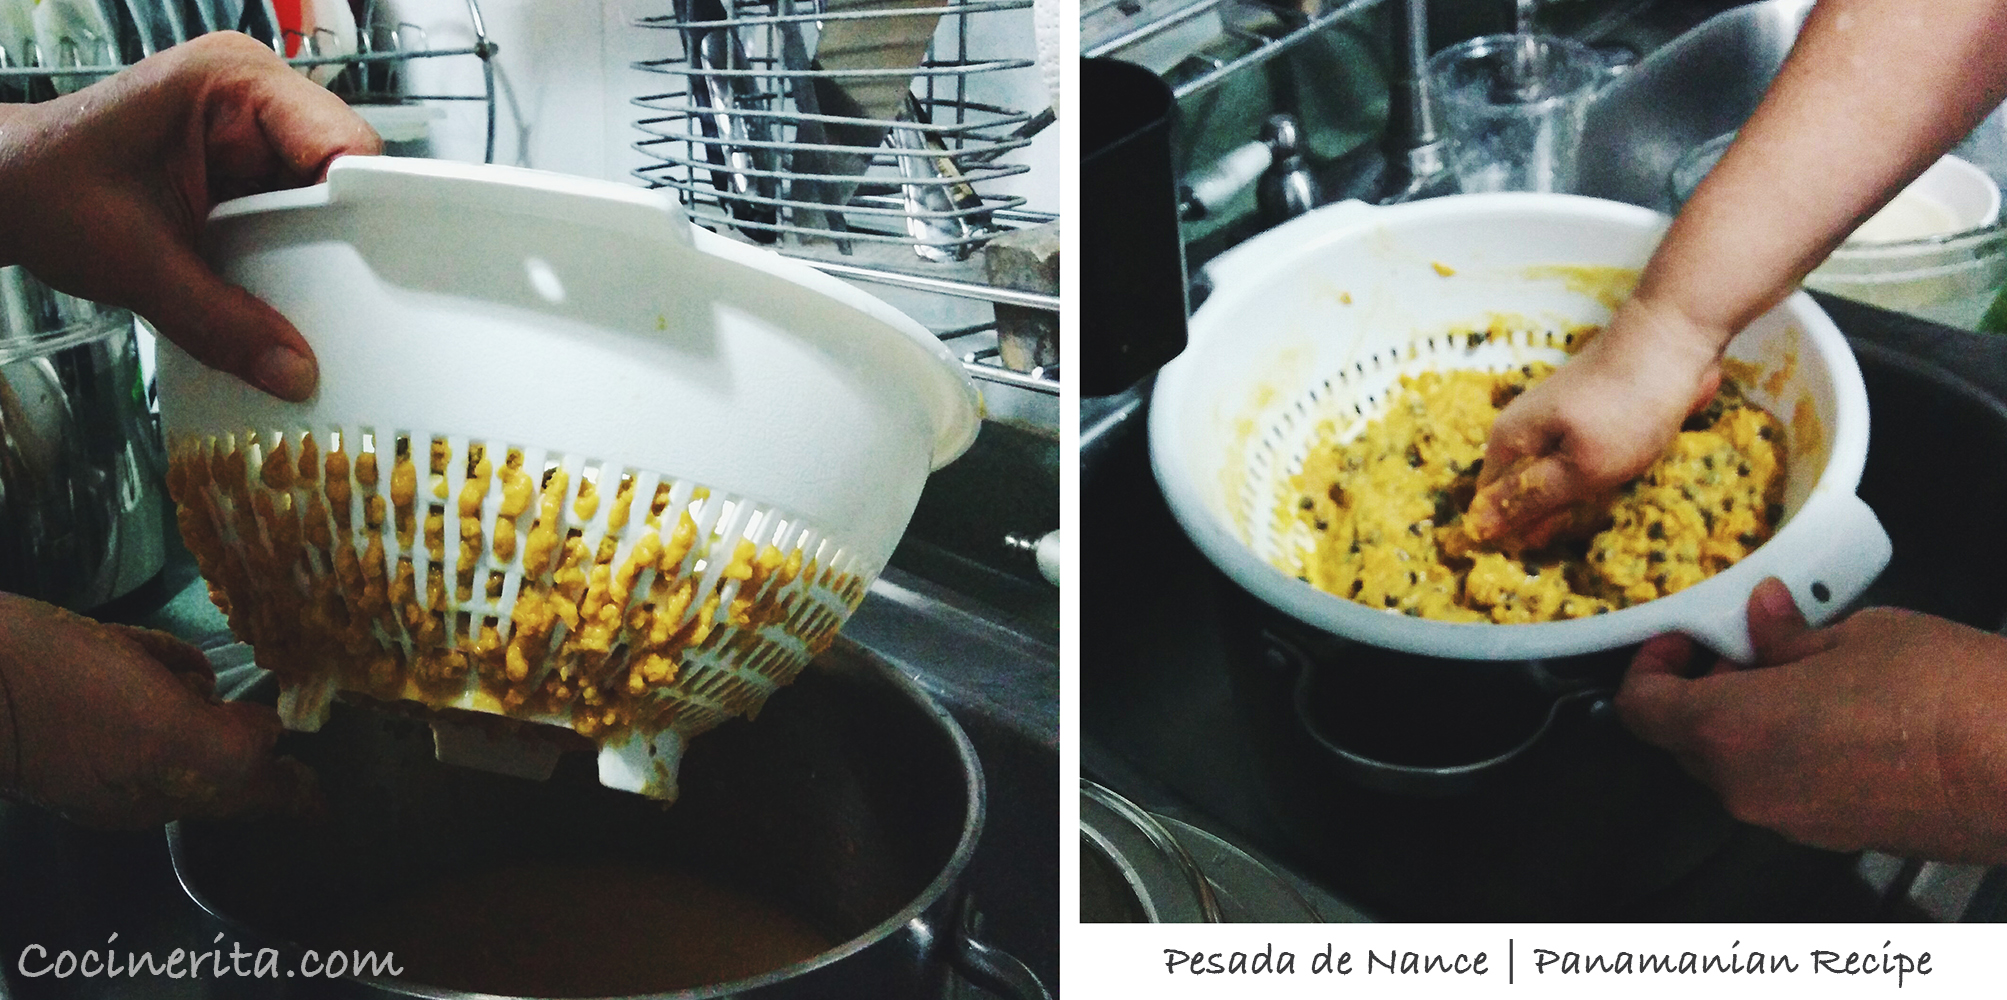 Pesada de Nance - Cocinerita Recipe